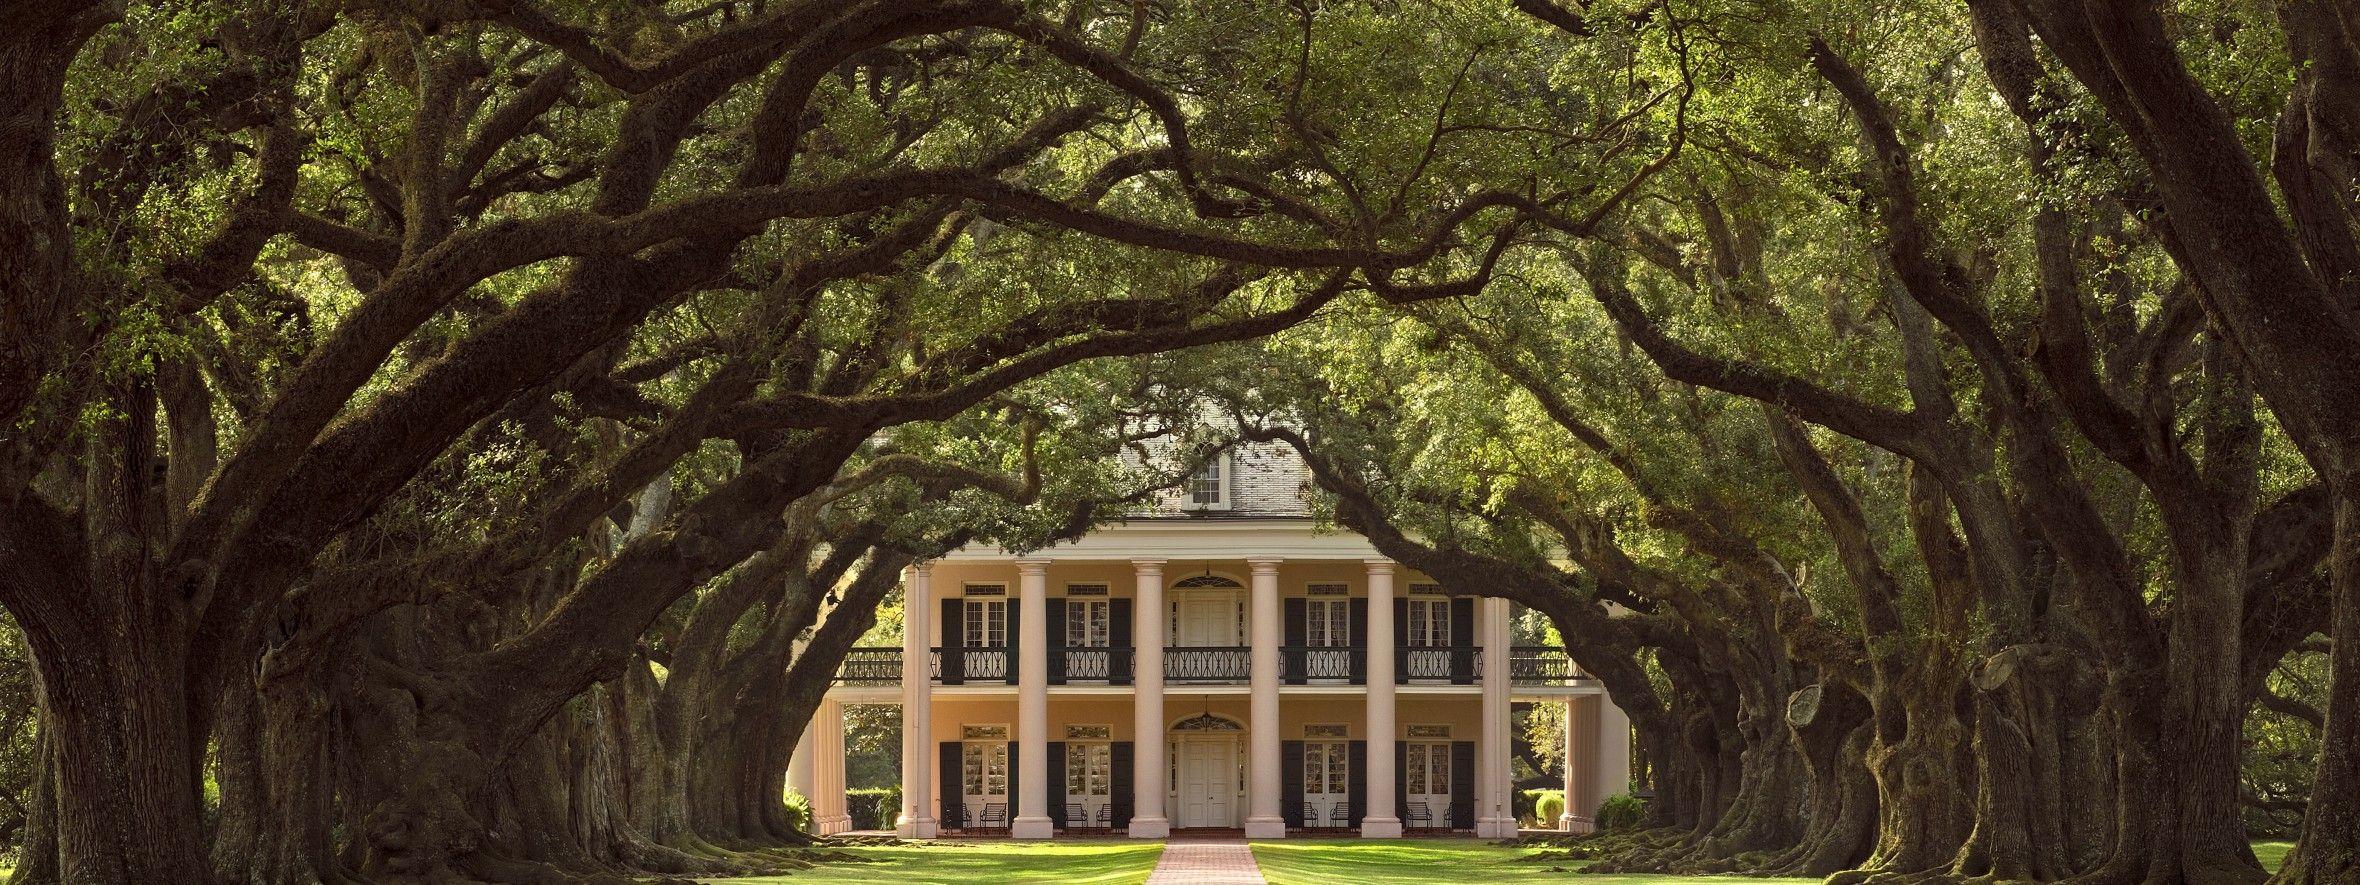 Oak Alley Plantation Antebellum Mansion, Historic Grounds